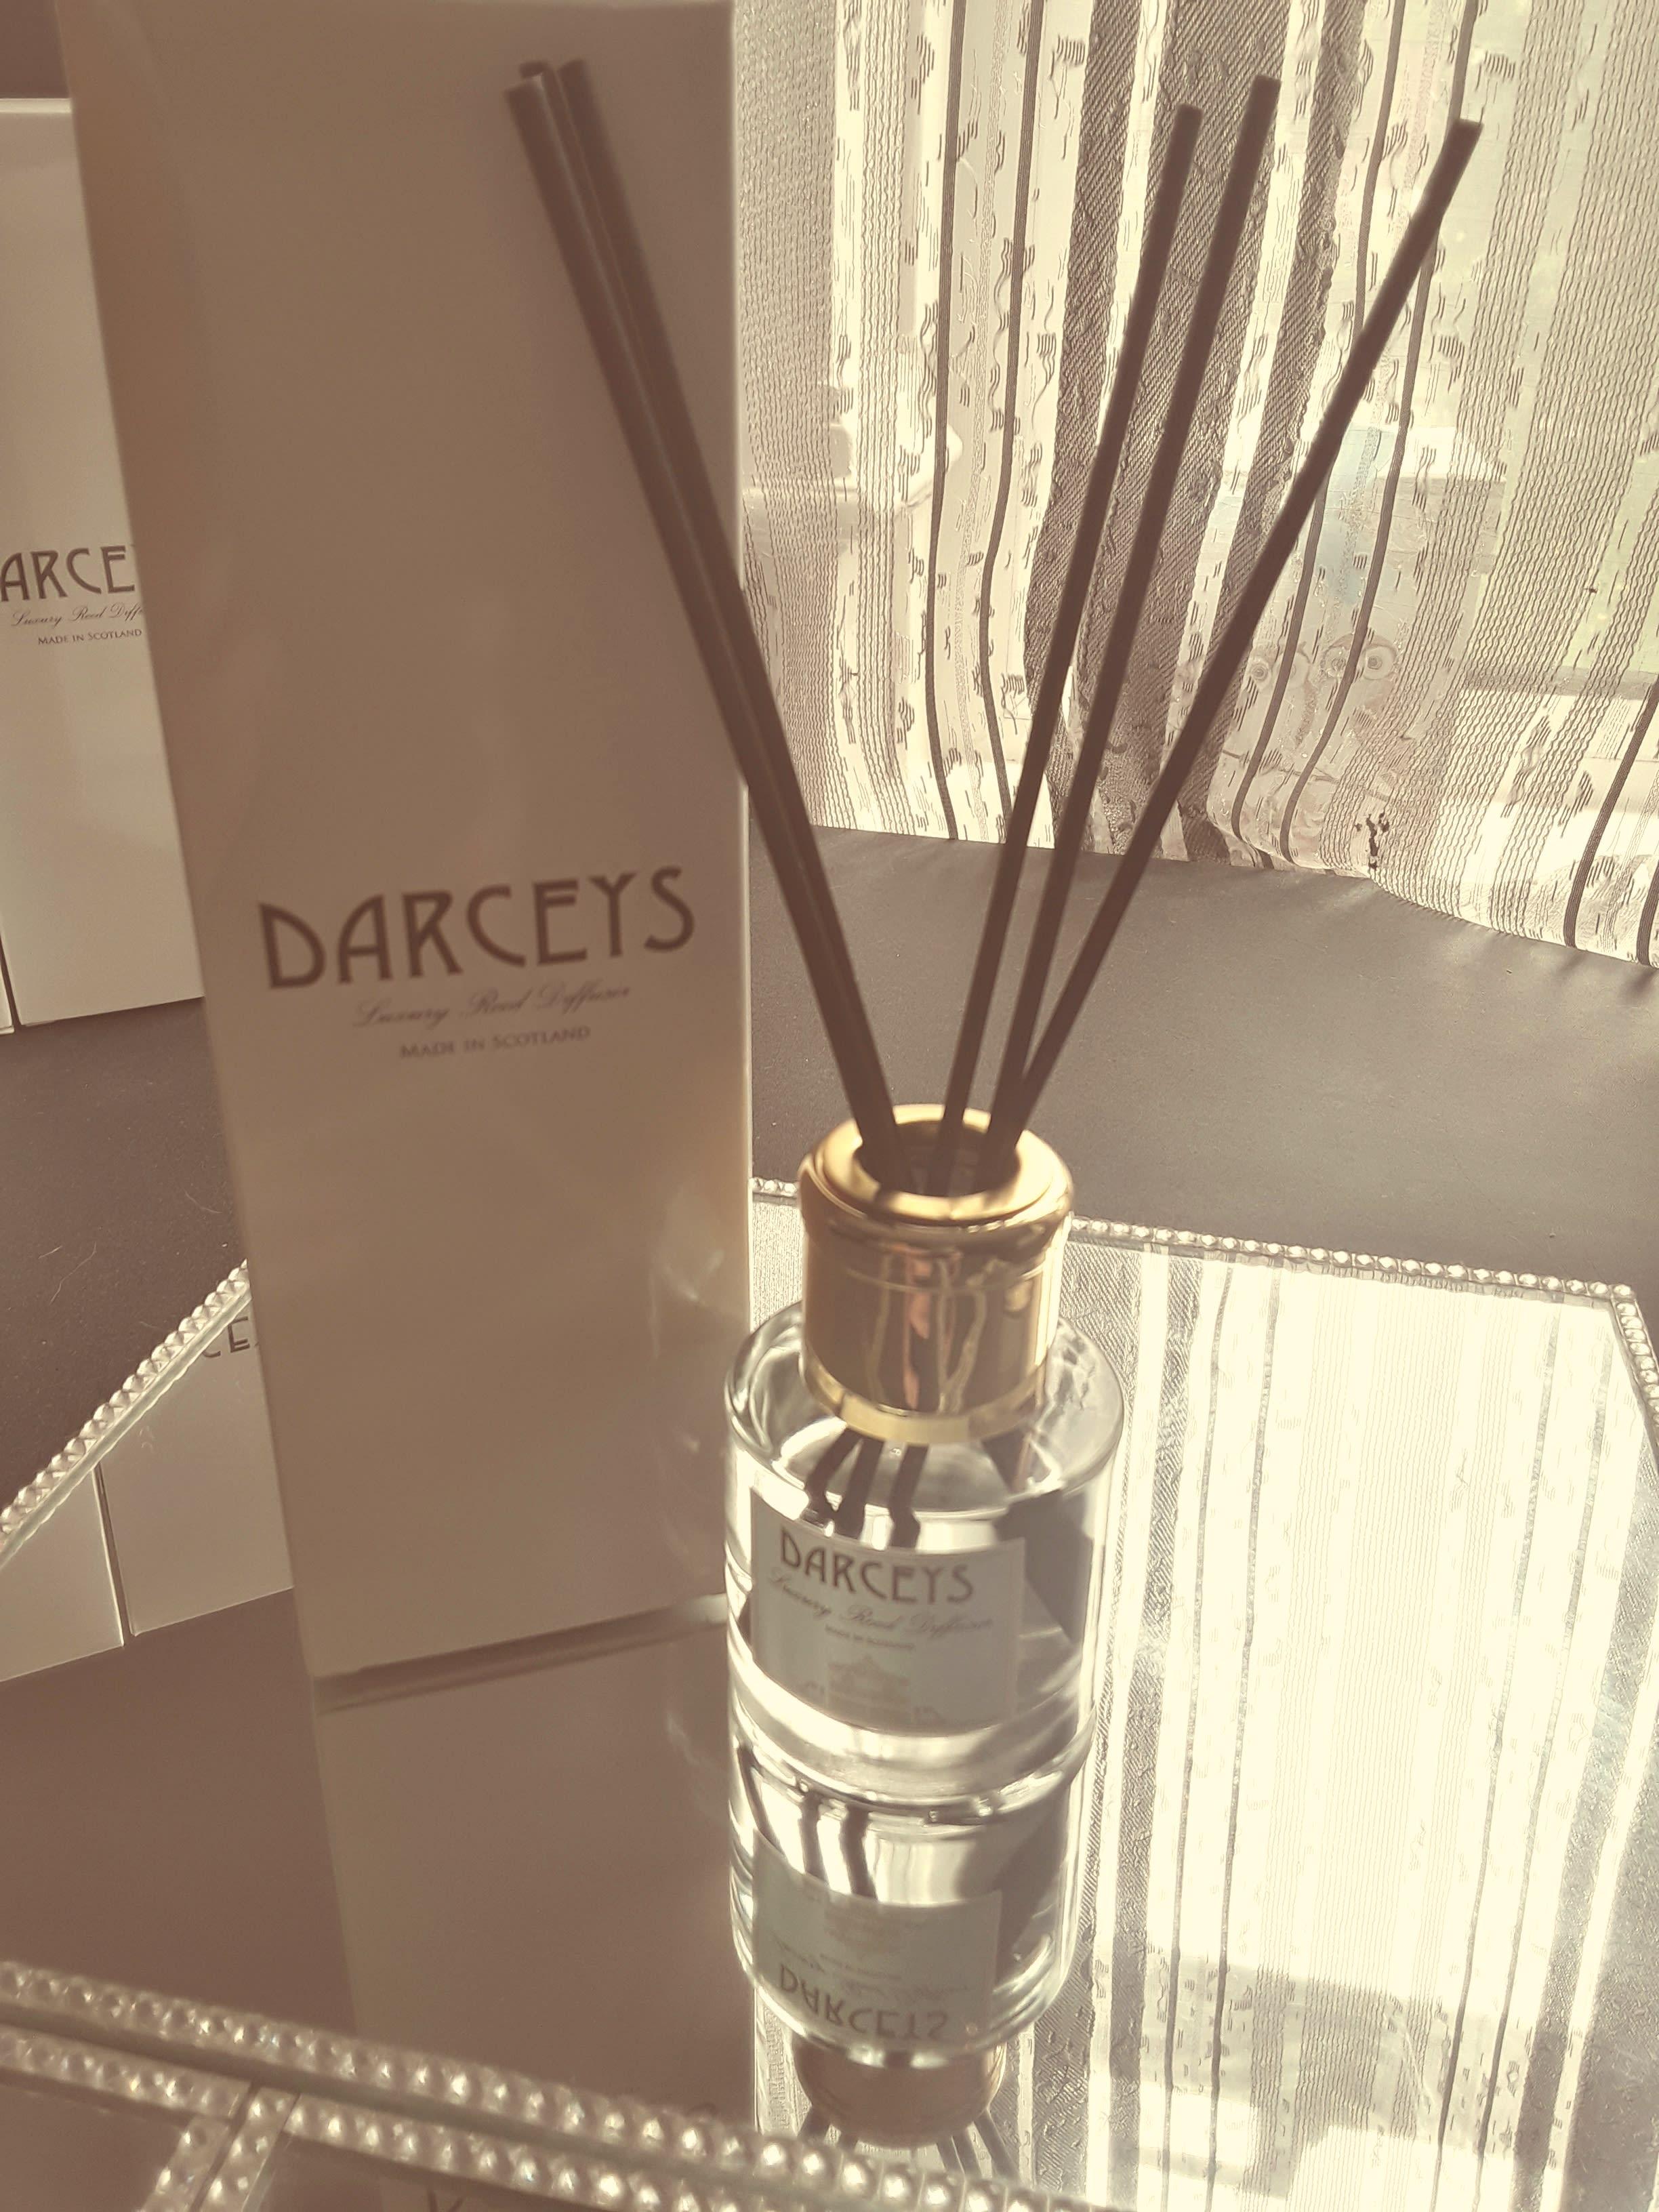 Darceys Scent Of Wickcraft